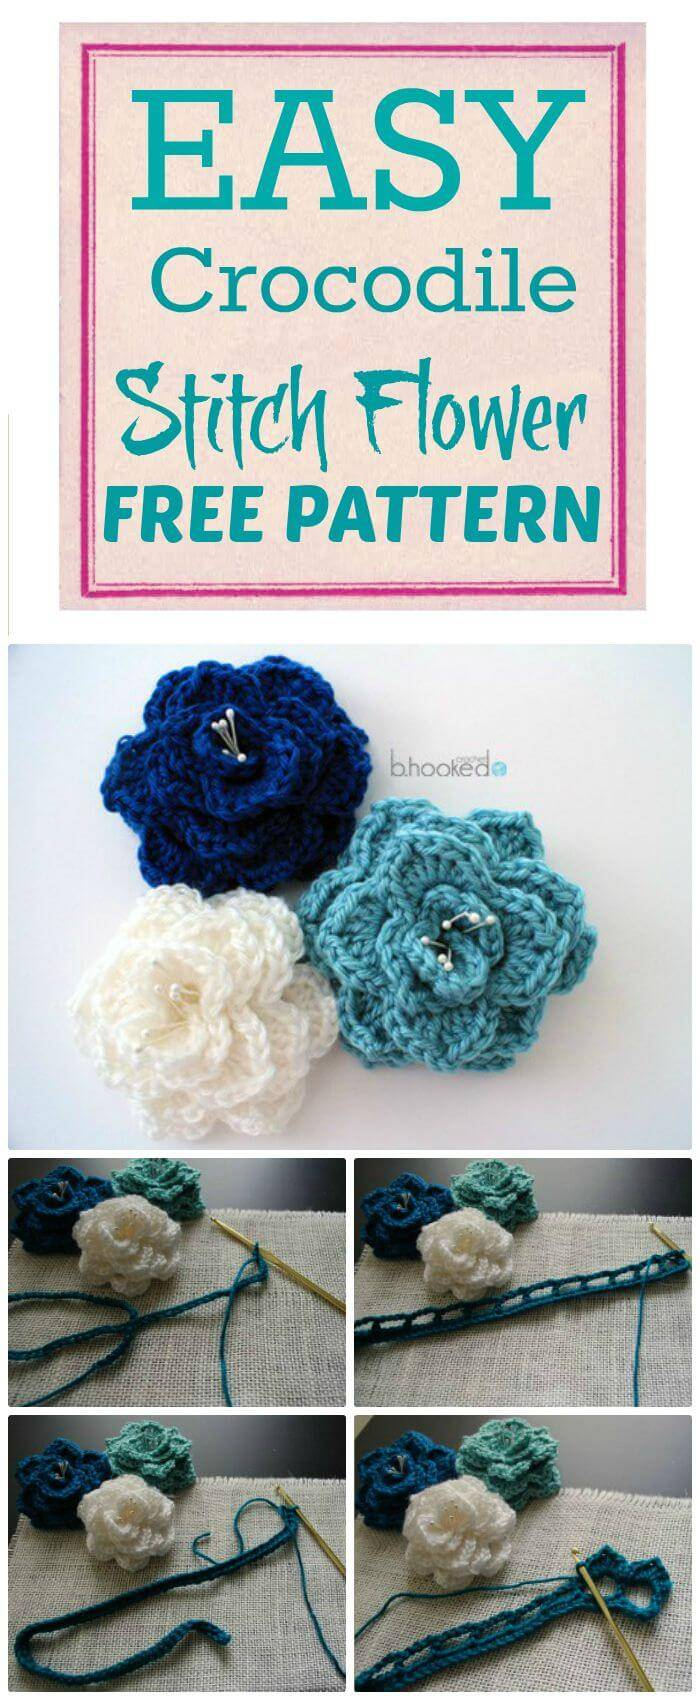 Crochet Flowers - 90+ FREE Crochet Flower Patterns - DIY Crafts